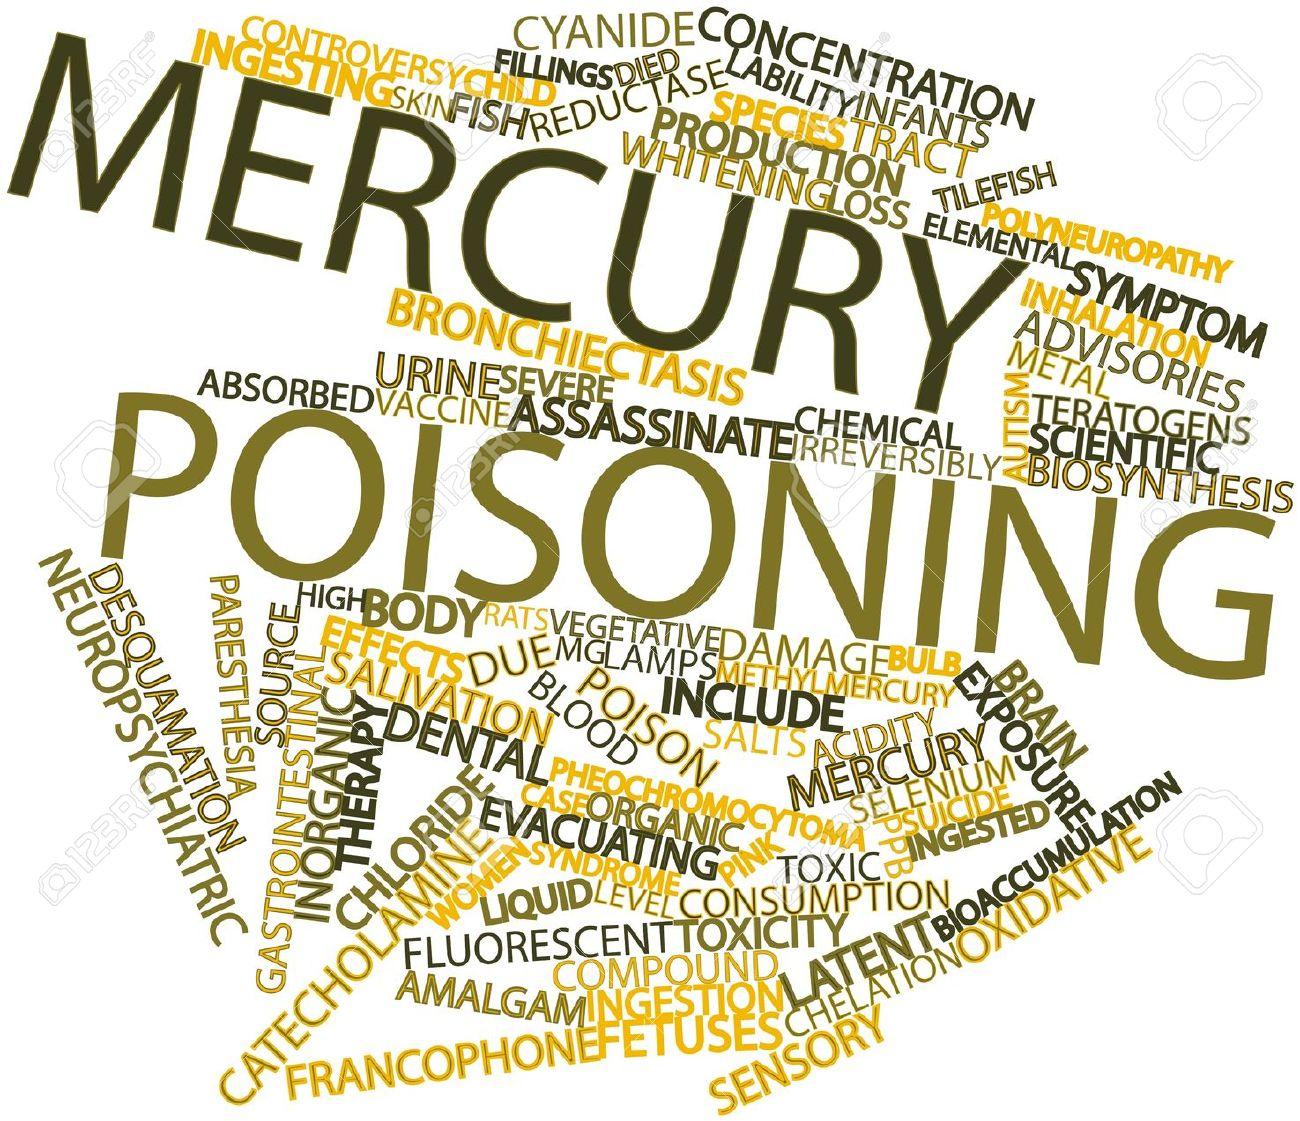 Skipjack Tuna Mercury Poisoning Symptoms - Tuna Skipjack Frozen